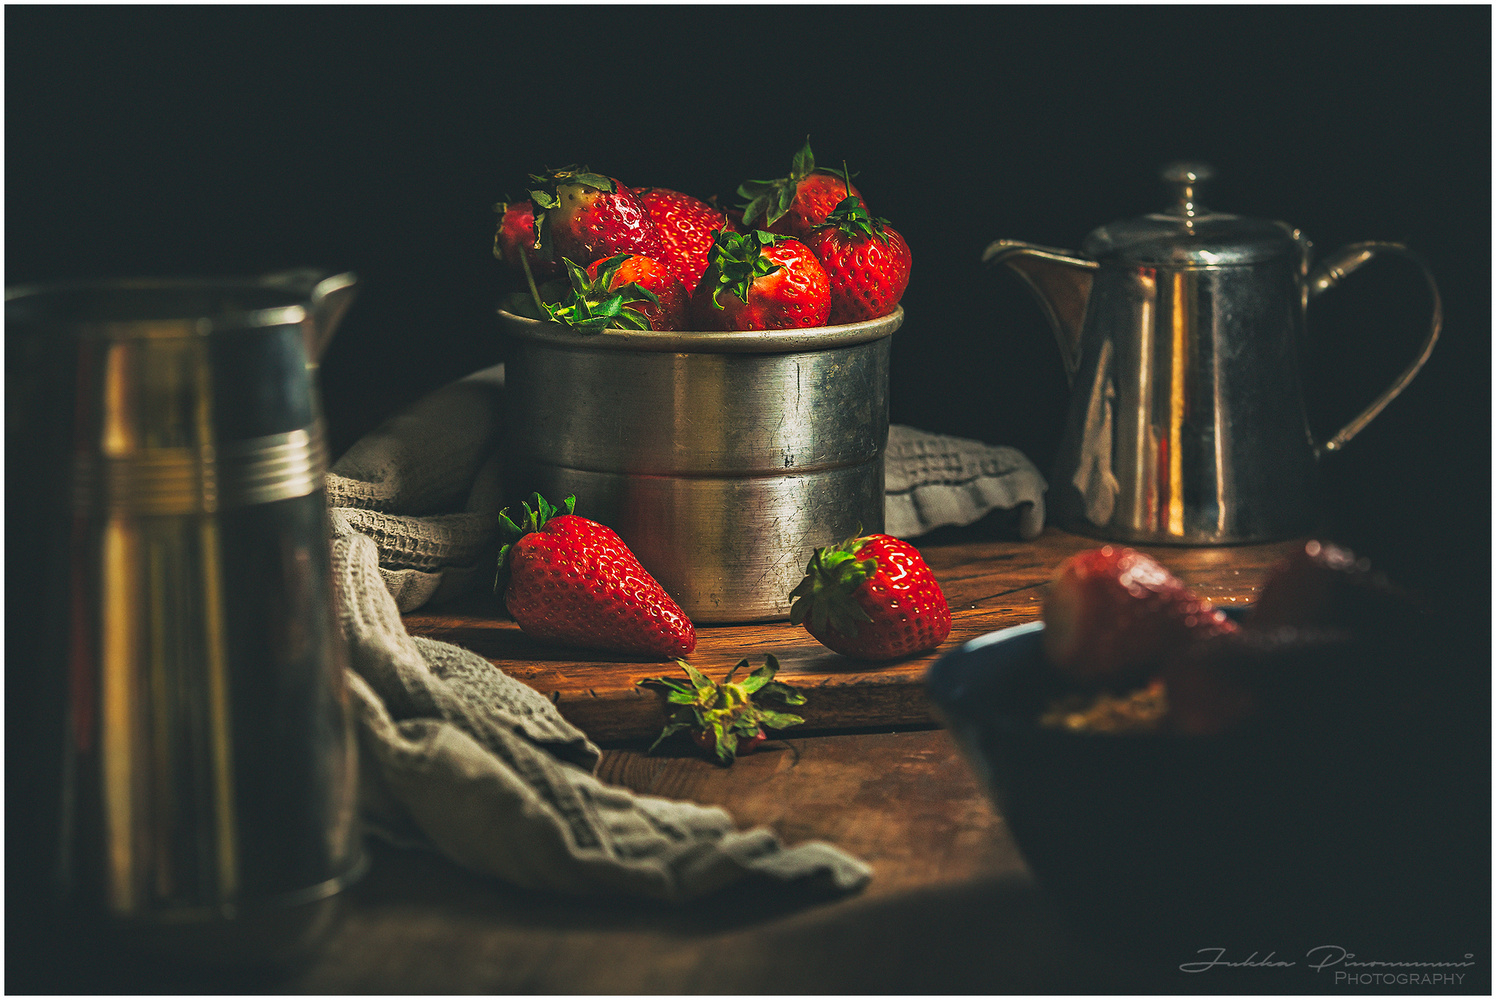 Strawberrys by Jukka Pinonummi